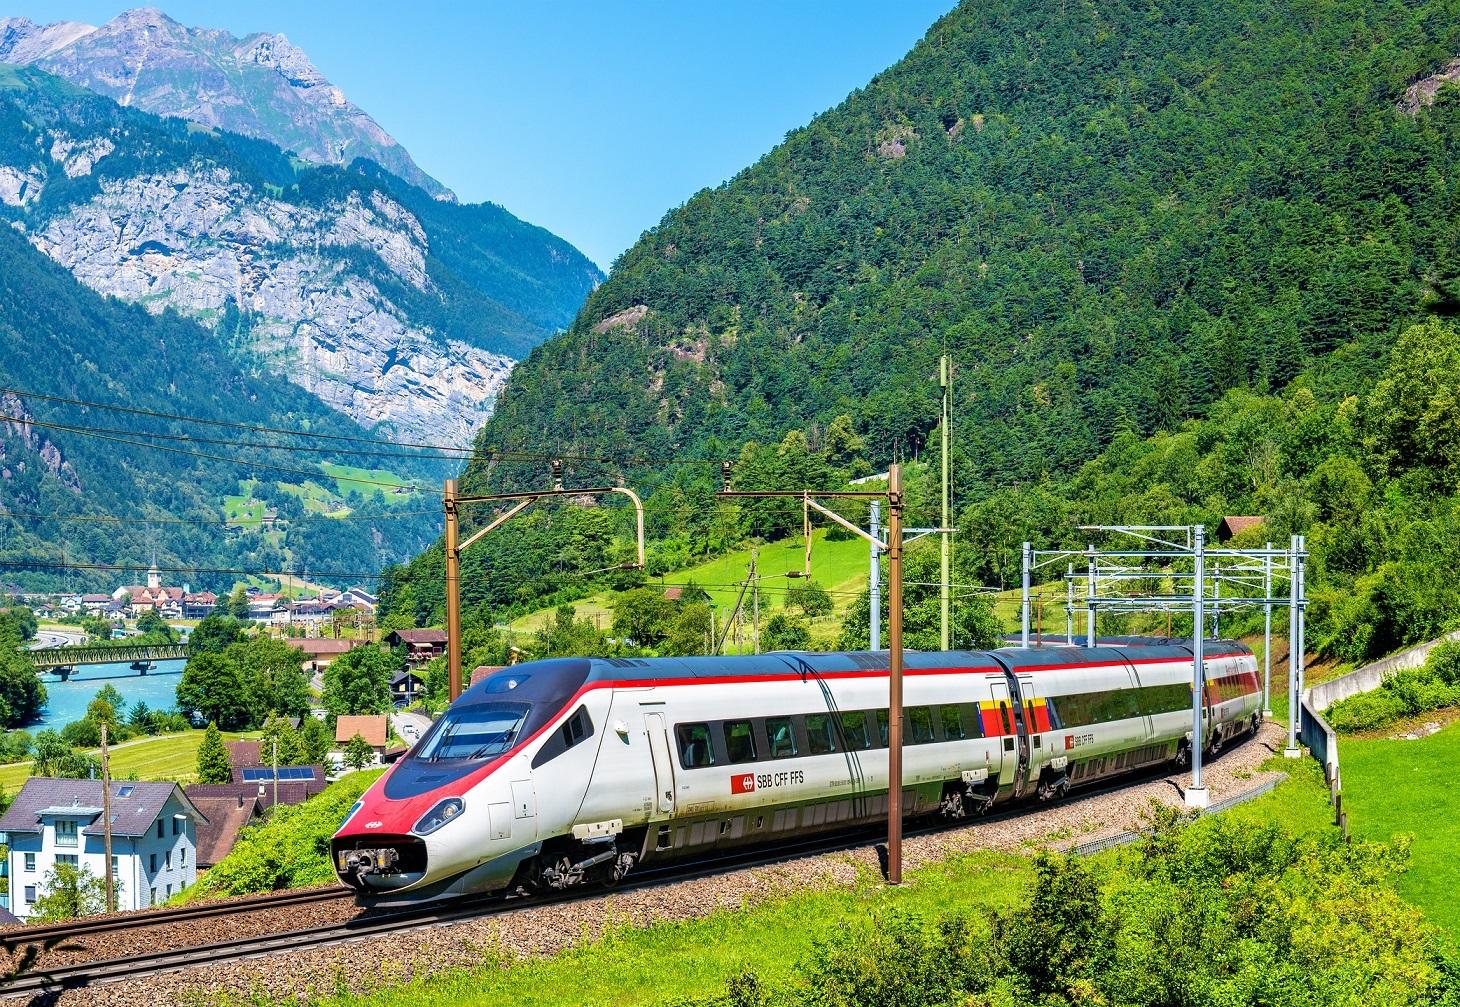 High-speed train on the Gotthard railway